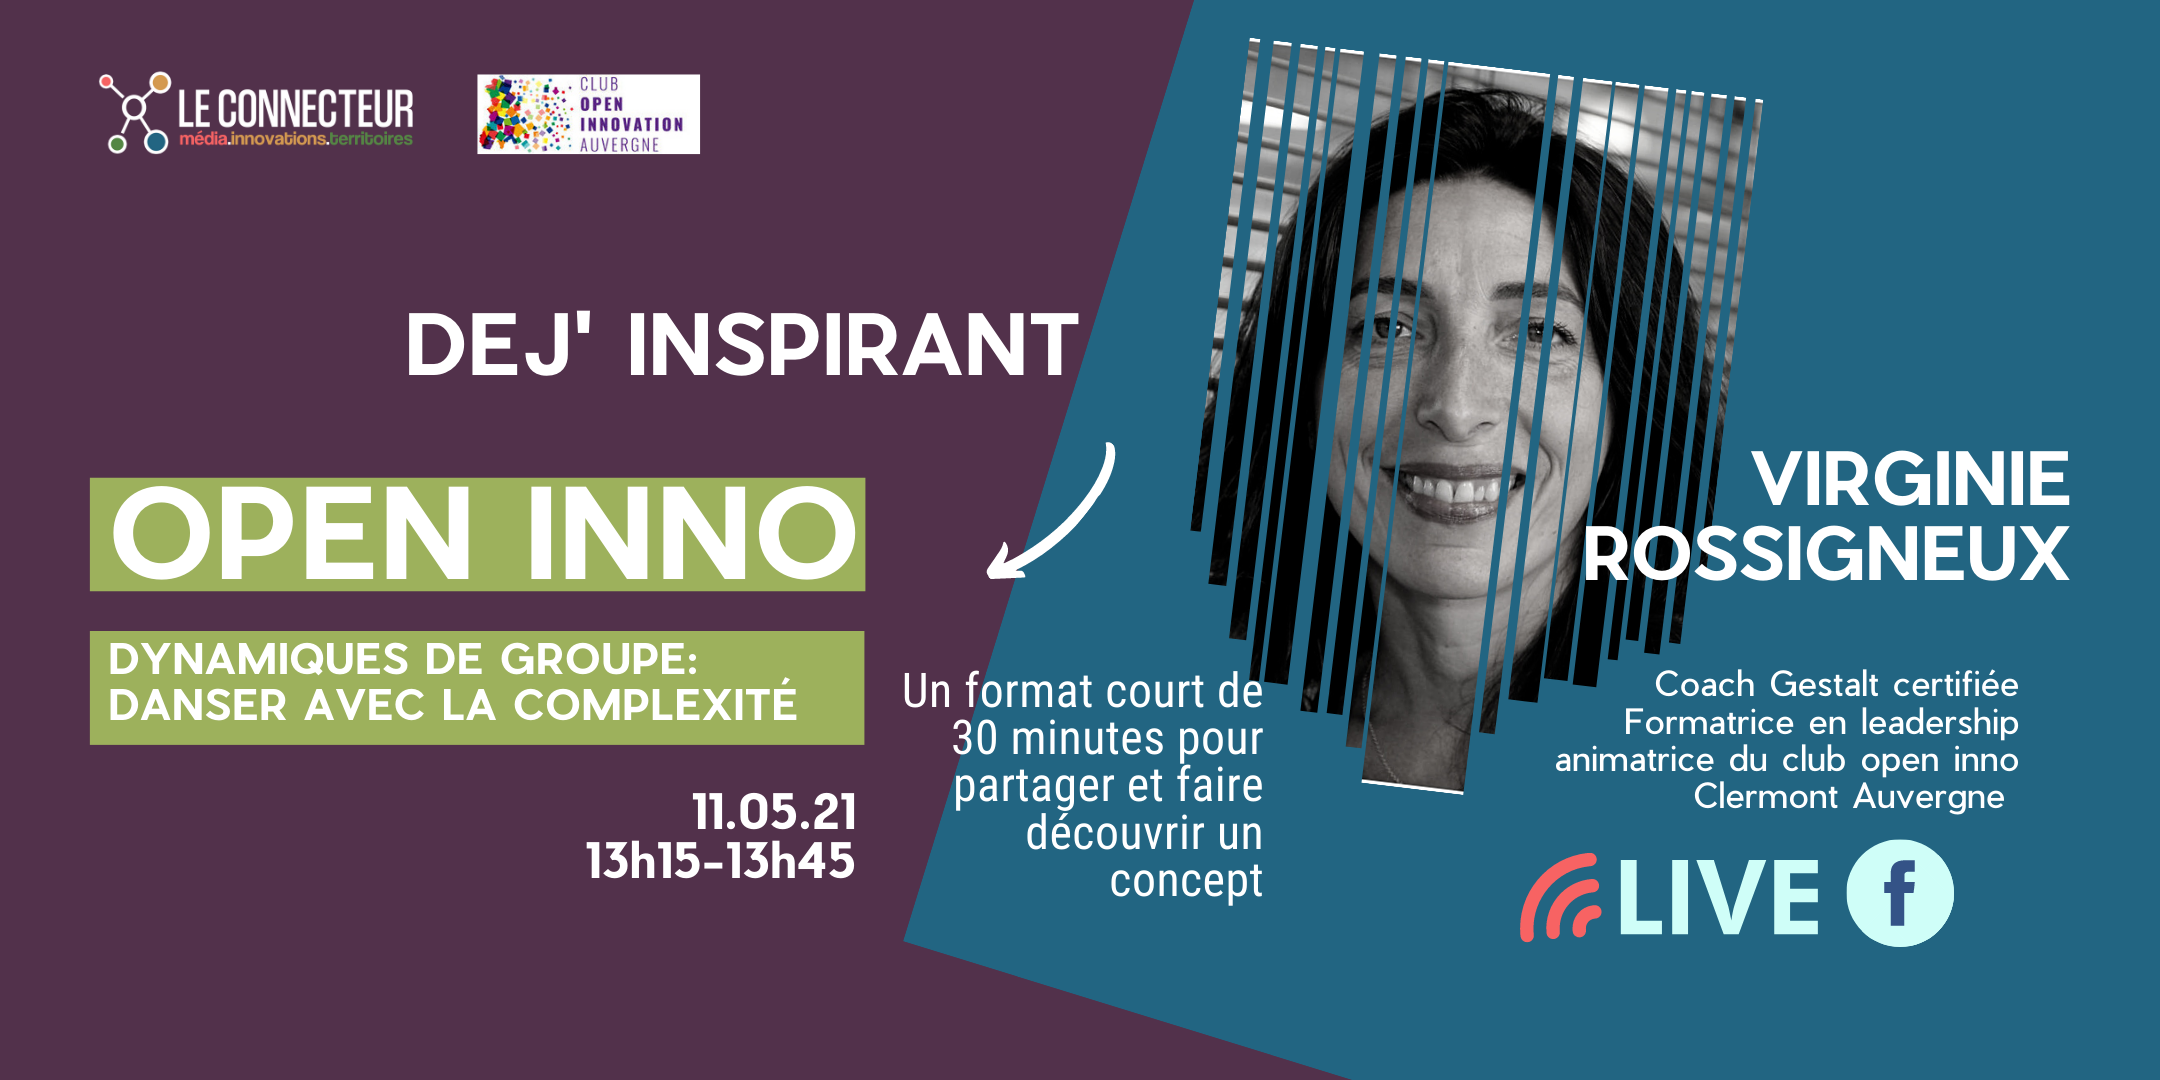 Dej'Inspirant Club Open Inno- Virginie Rossigneux. @ Turing 22 | Clermont-Ferrand | Auvergne-Rhône-Alpes | France